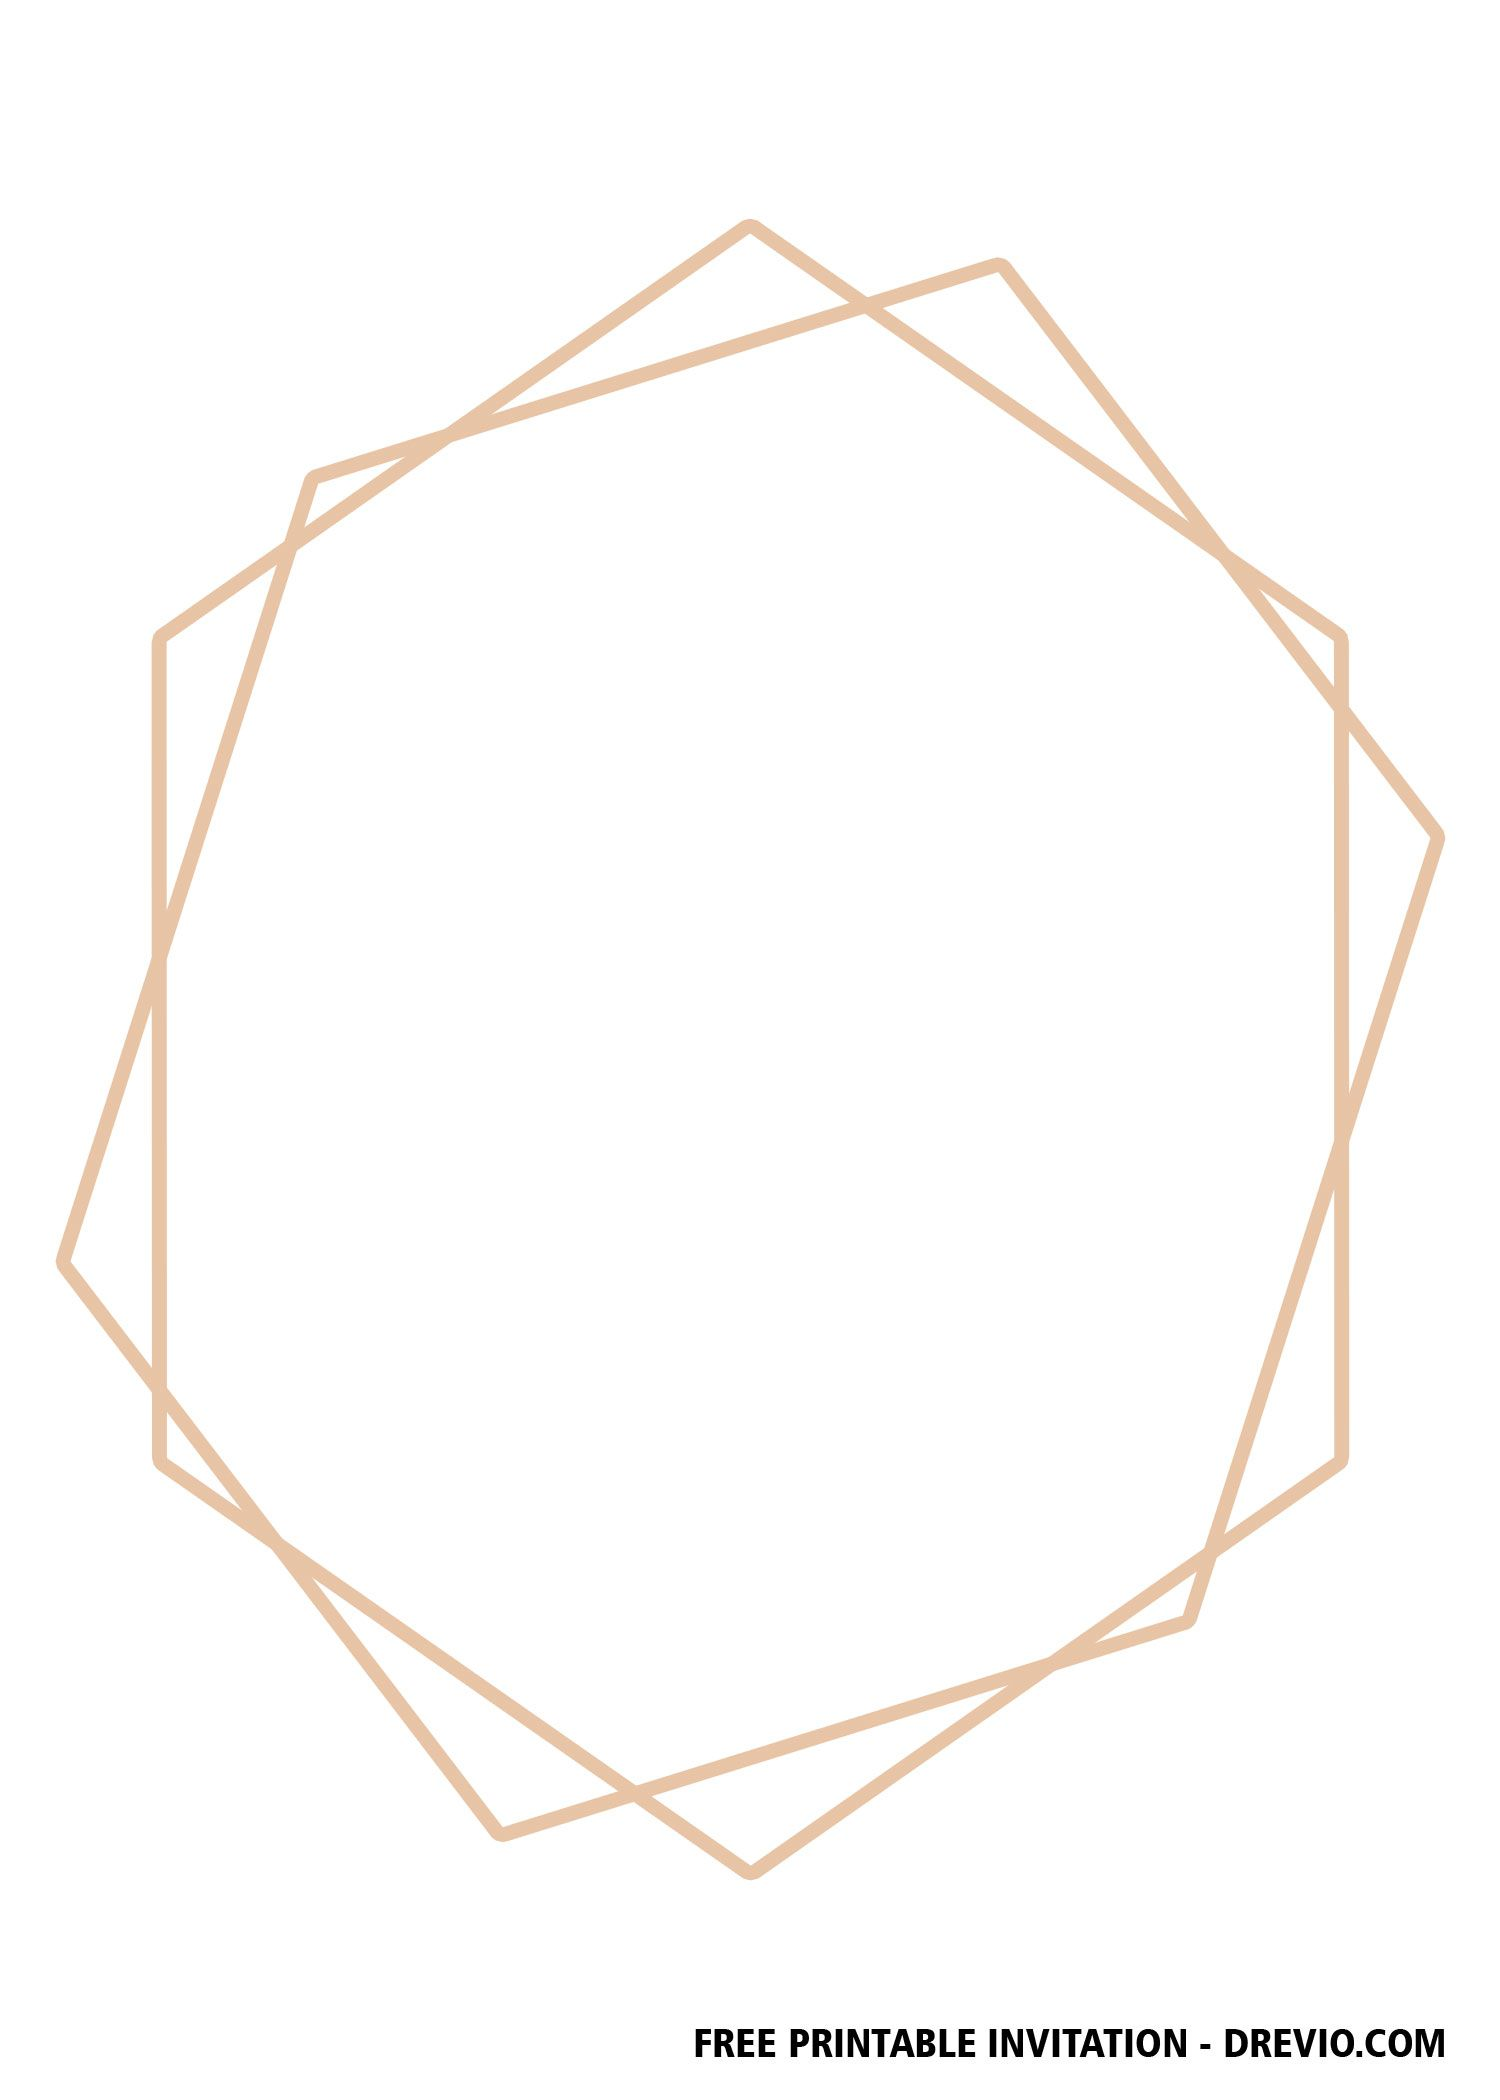 Free Gold Geometric Invitation Templates Geometric Invitations Gold Geometric Geometric